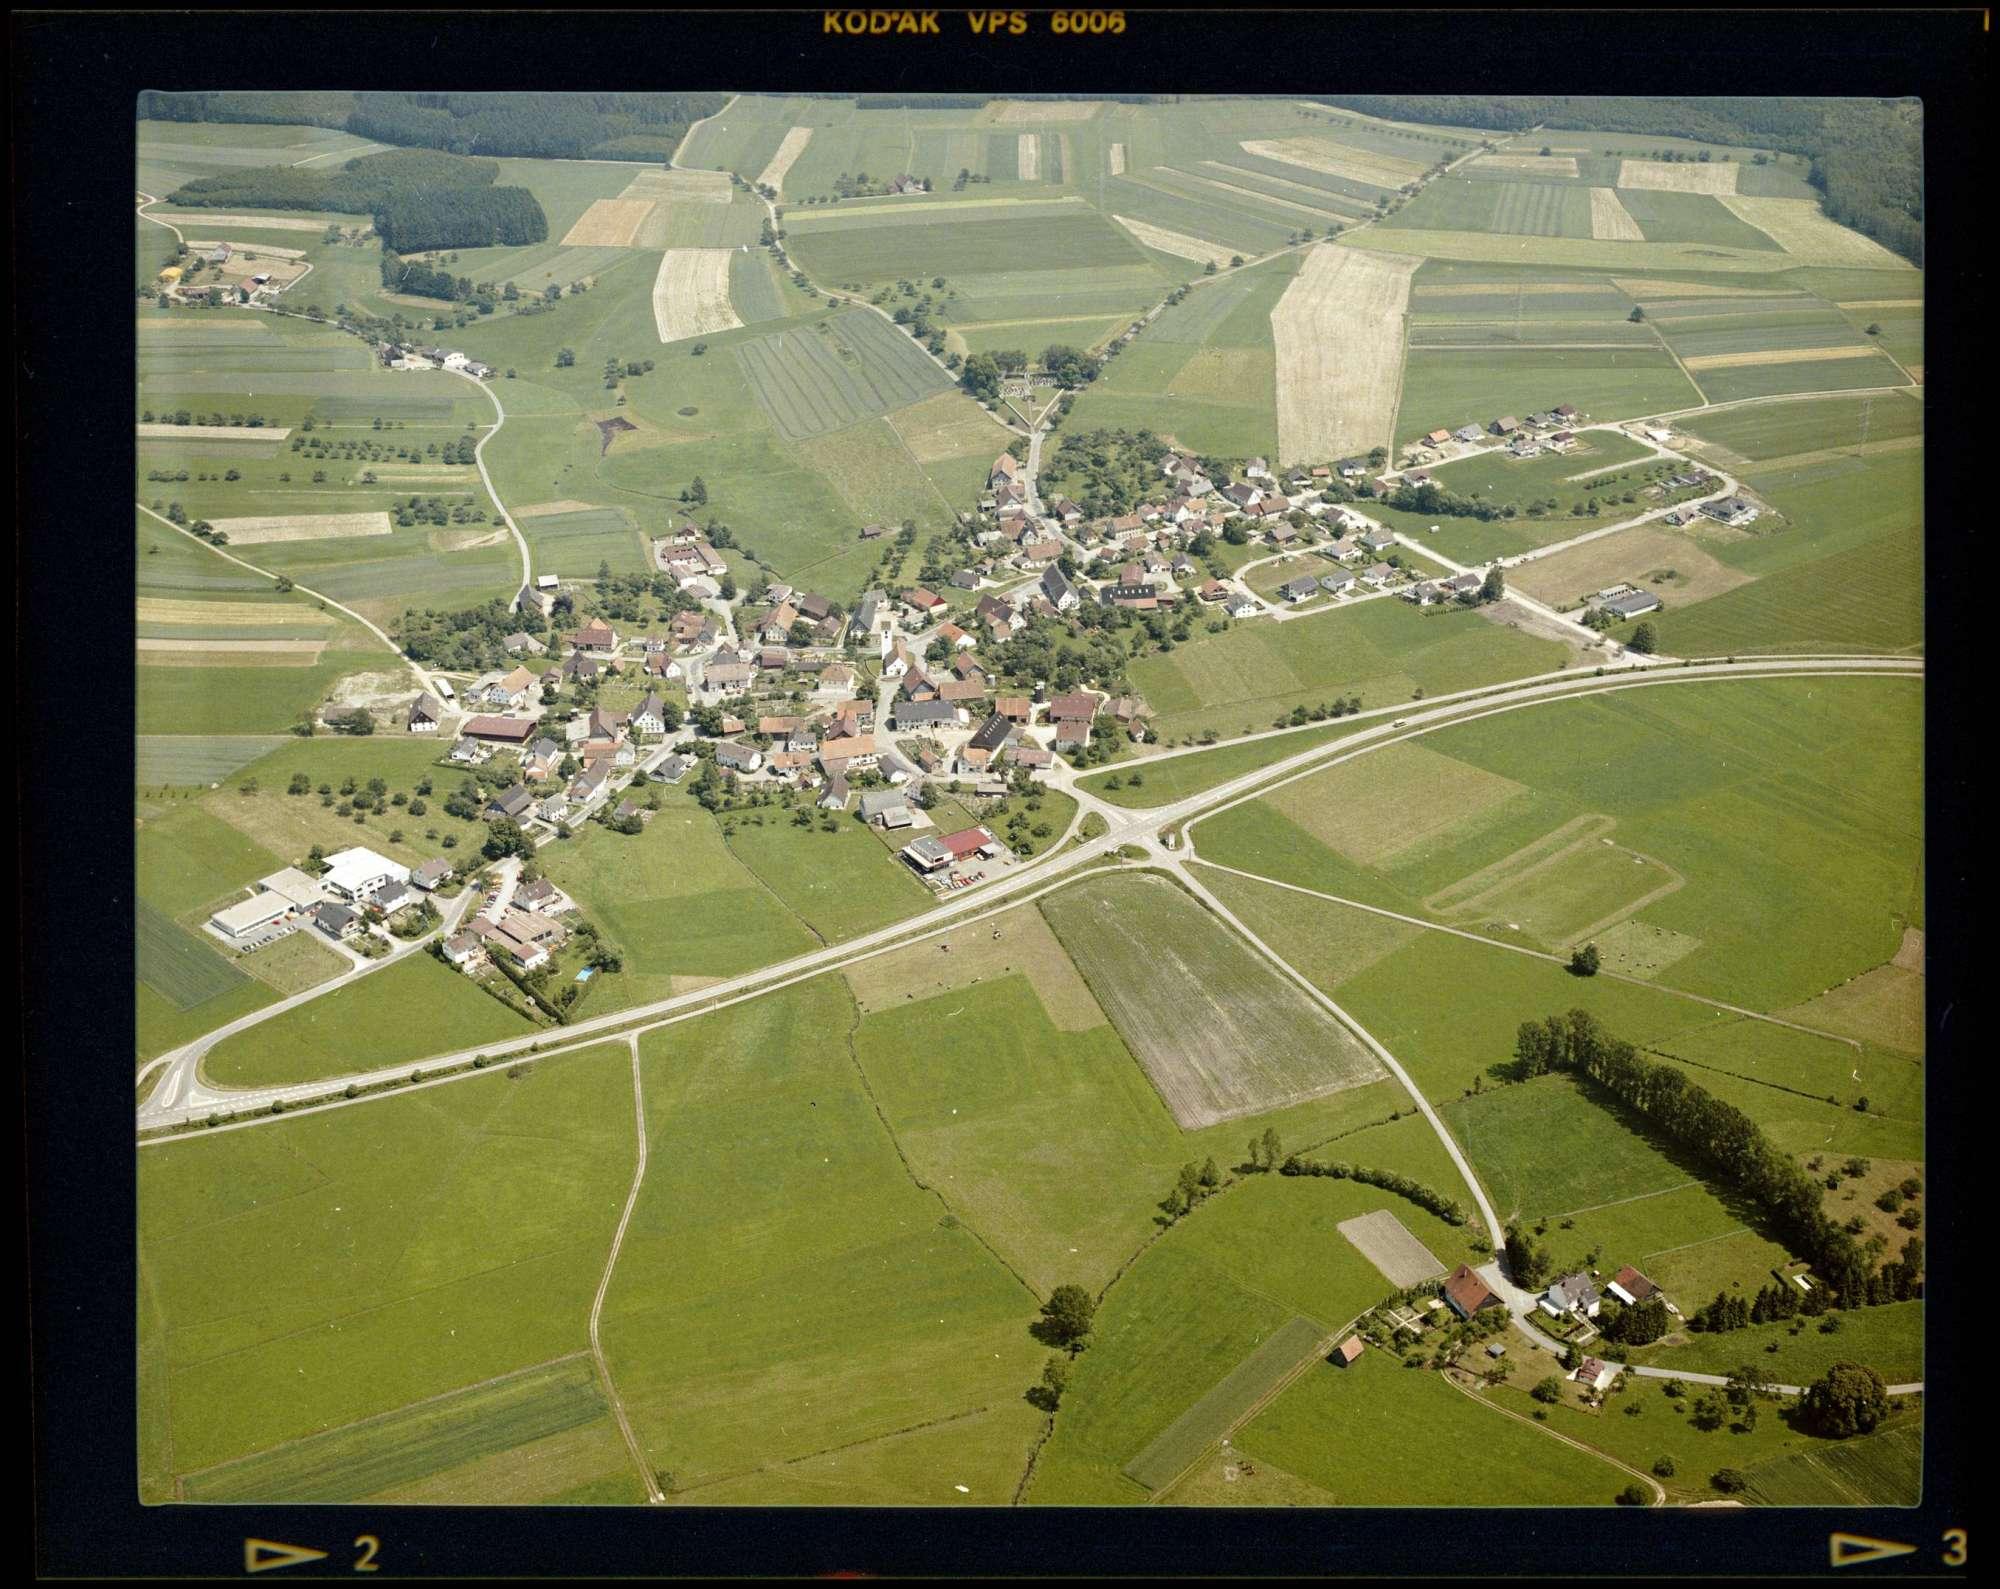 Rast, Luftbild, Bild 1